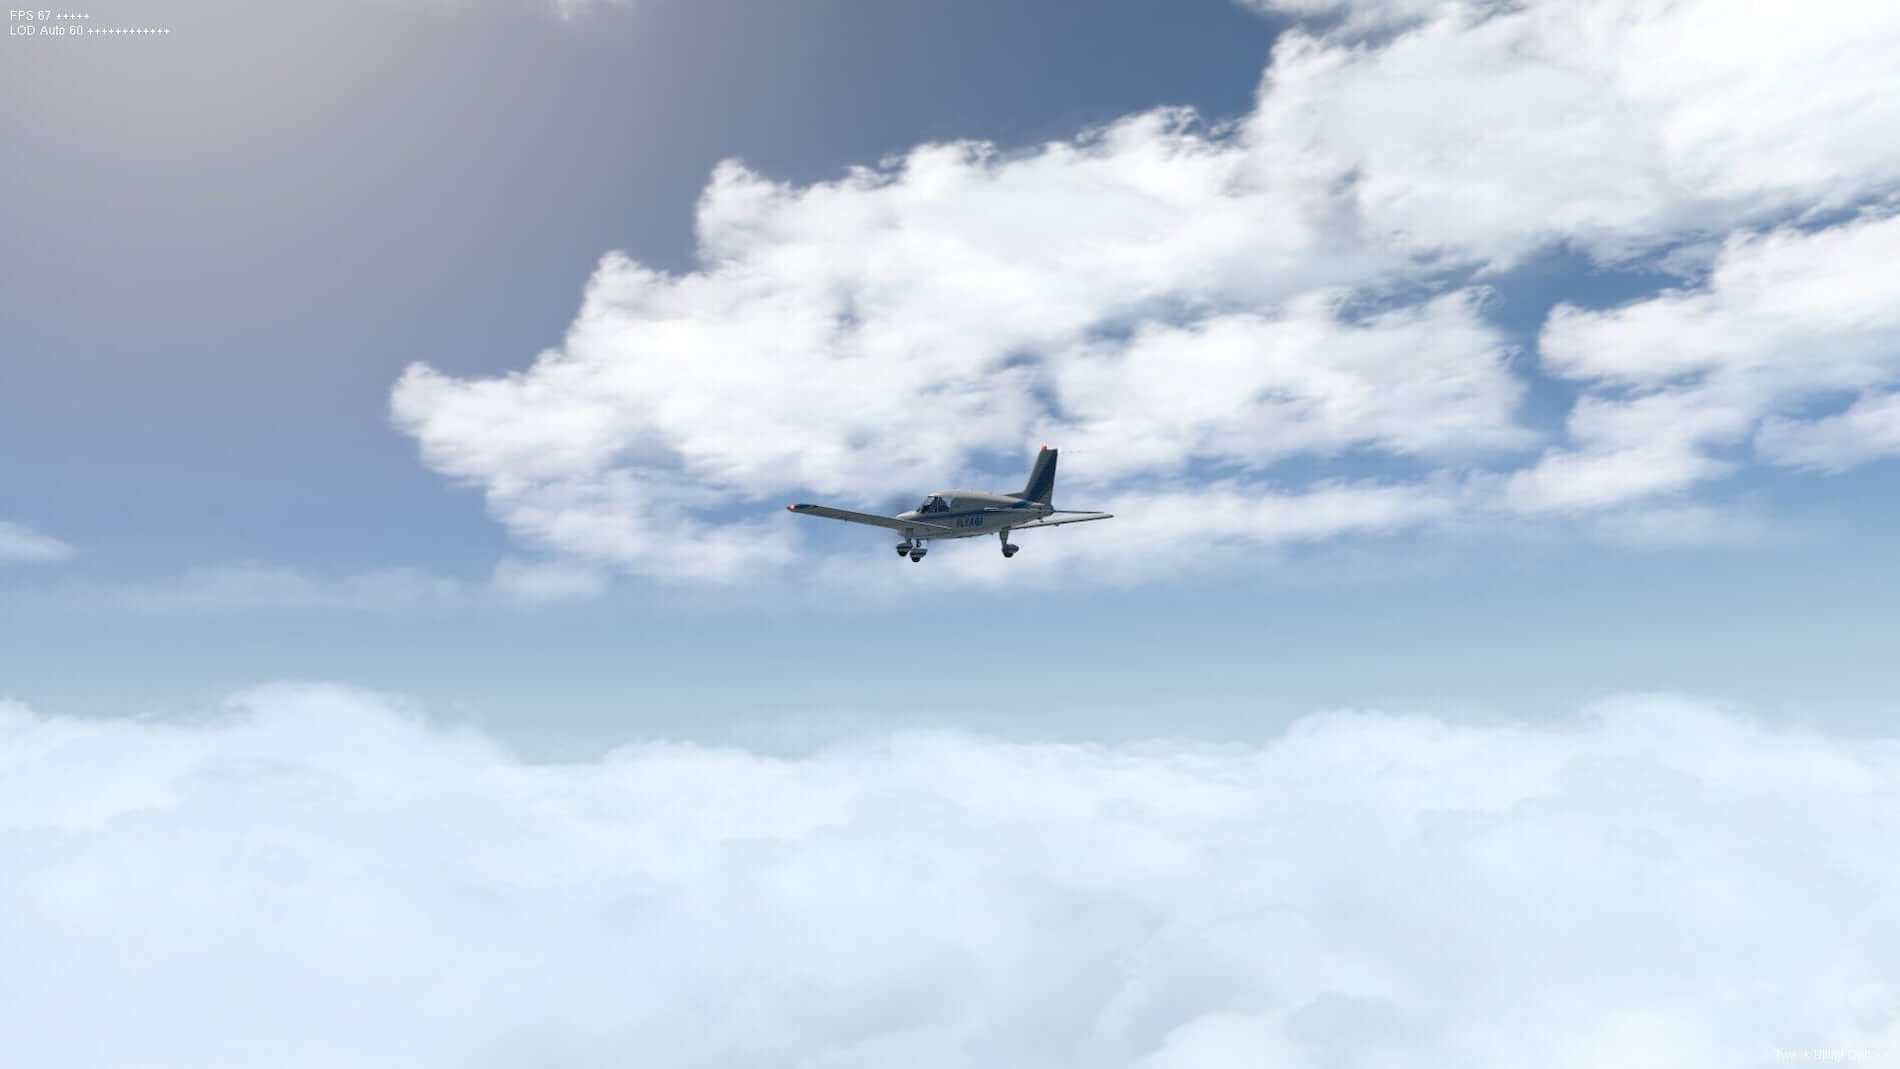 FlyAGI-FTU-Weather-System-ASXP-16